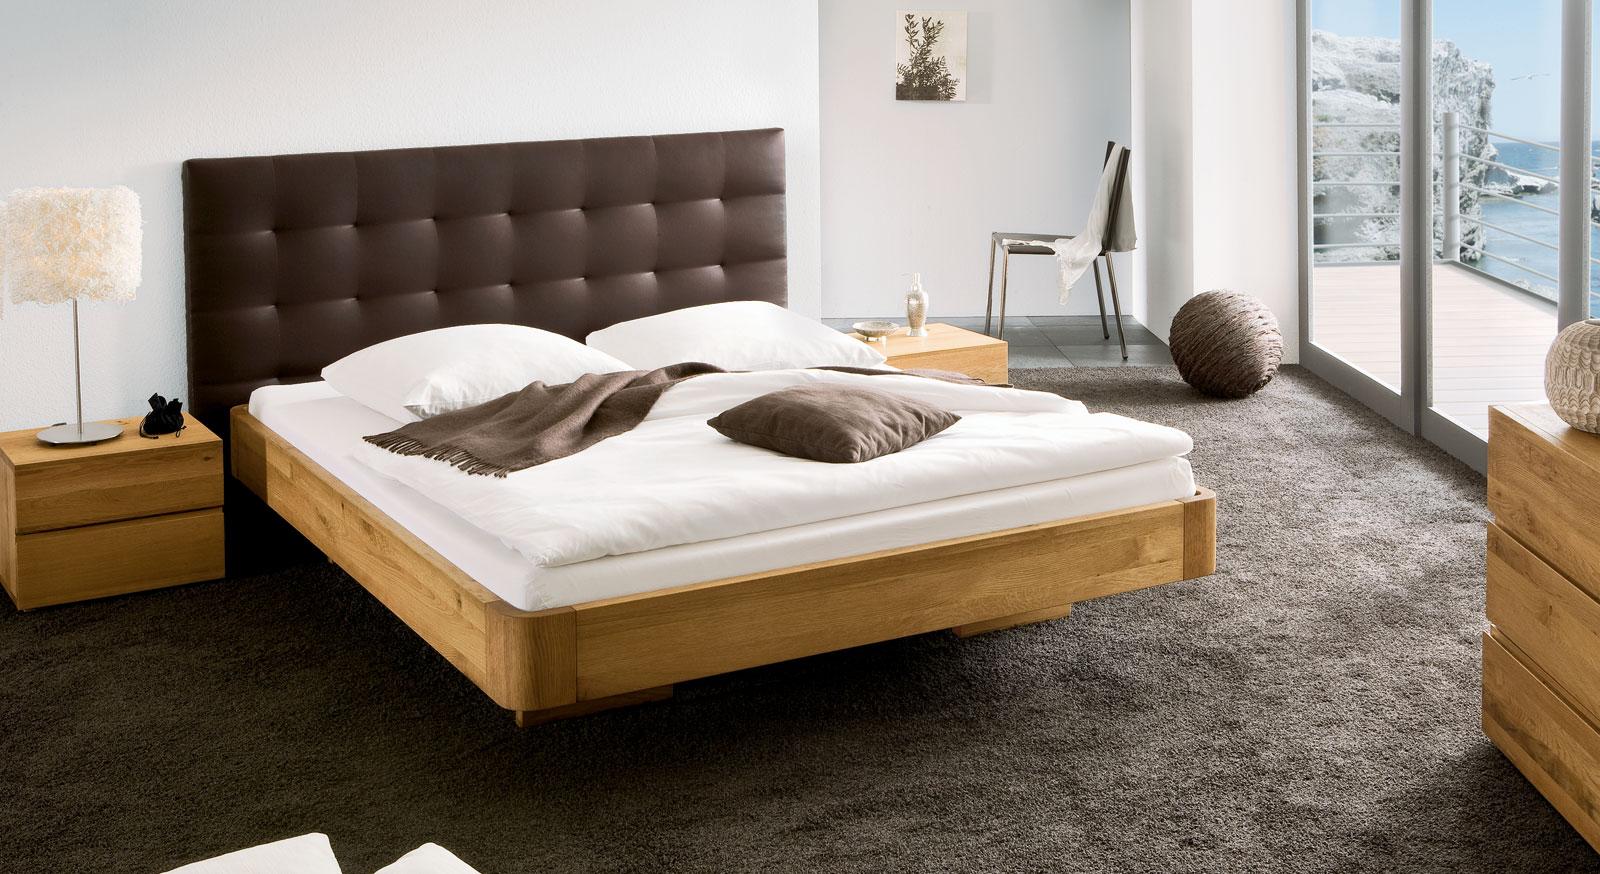 Massivholzbett schwebend  Bett schwebende Optik aus Eiche natur behandelt - Bett Panama